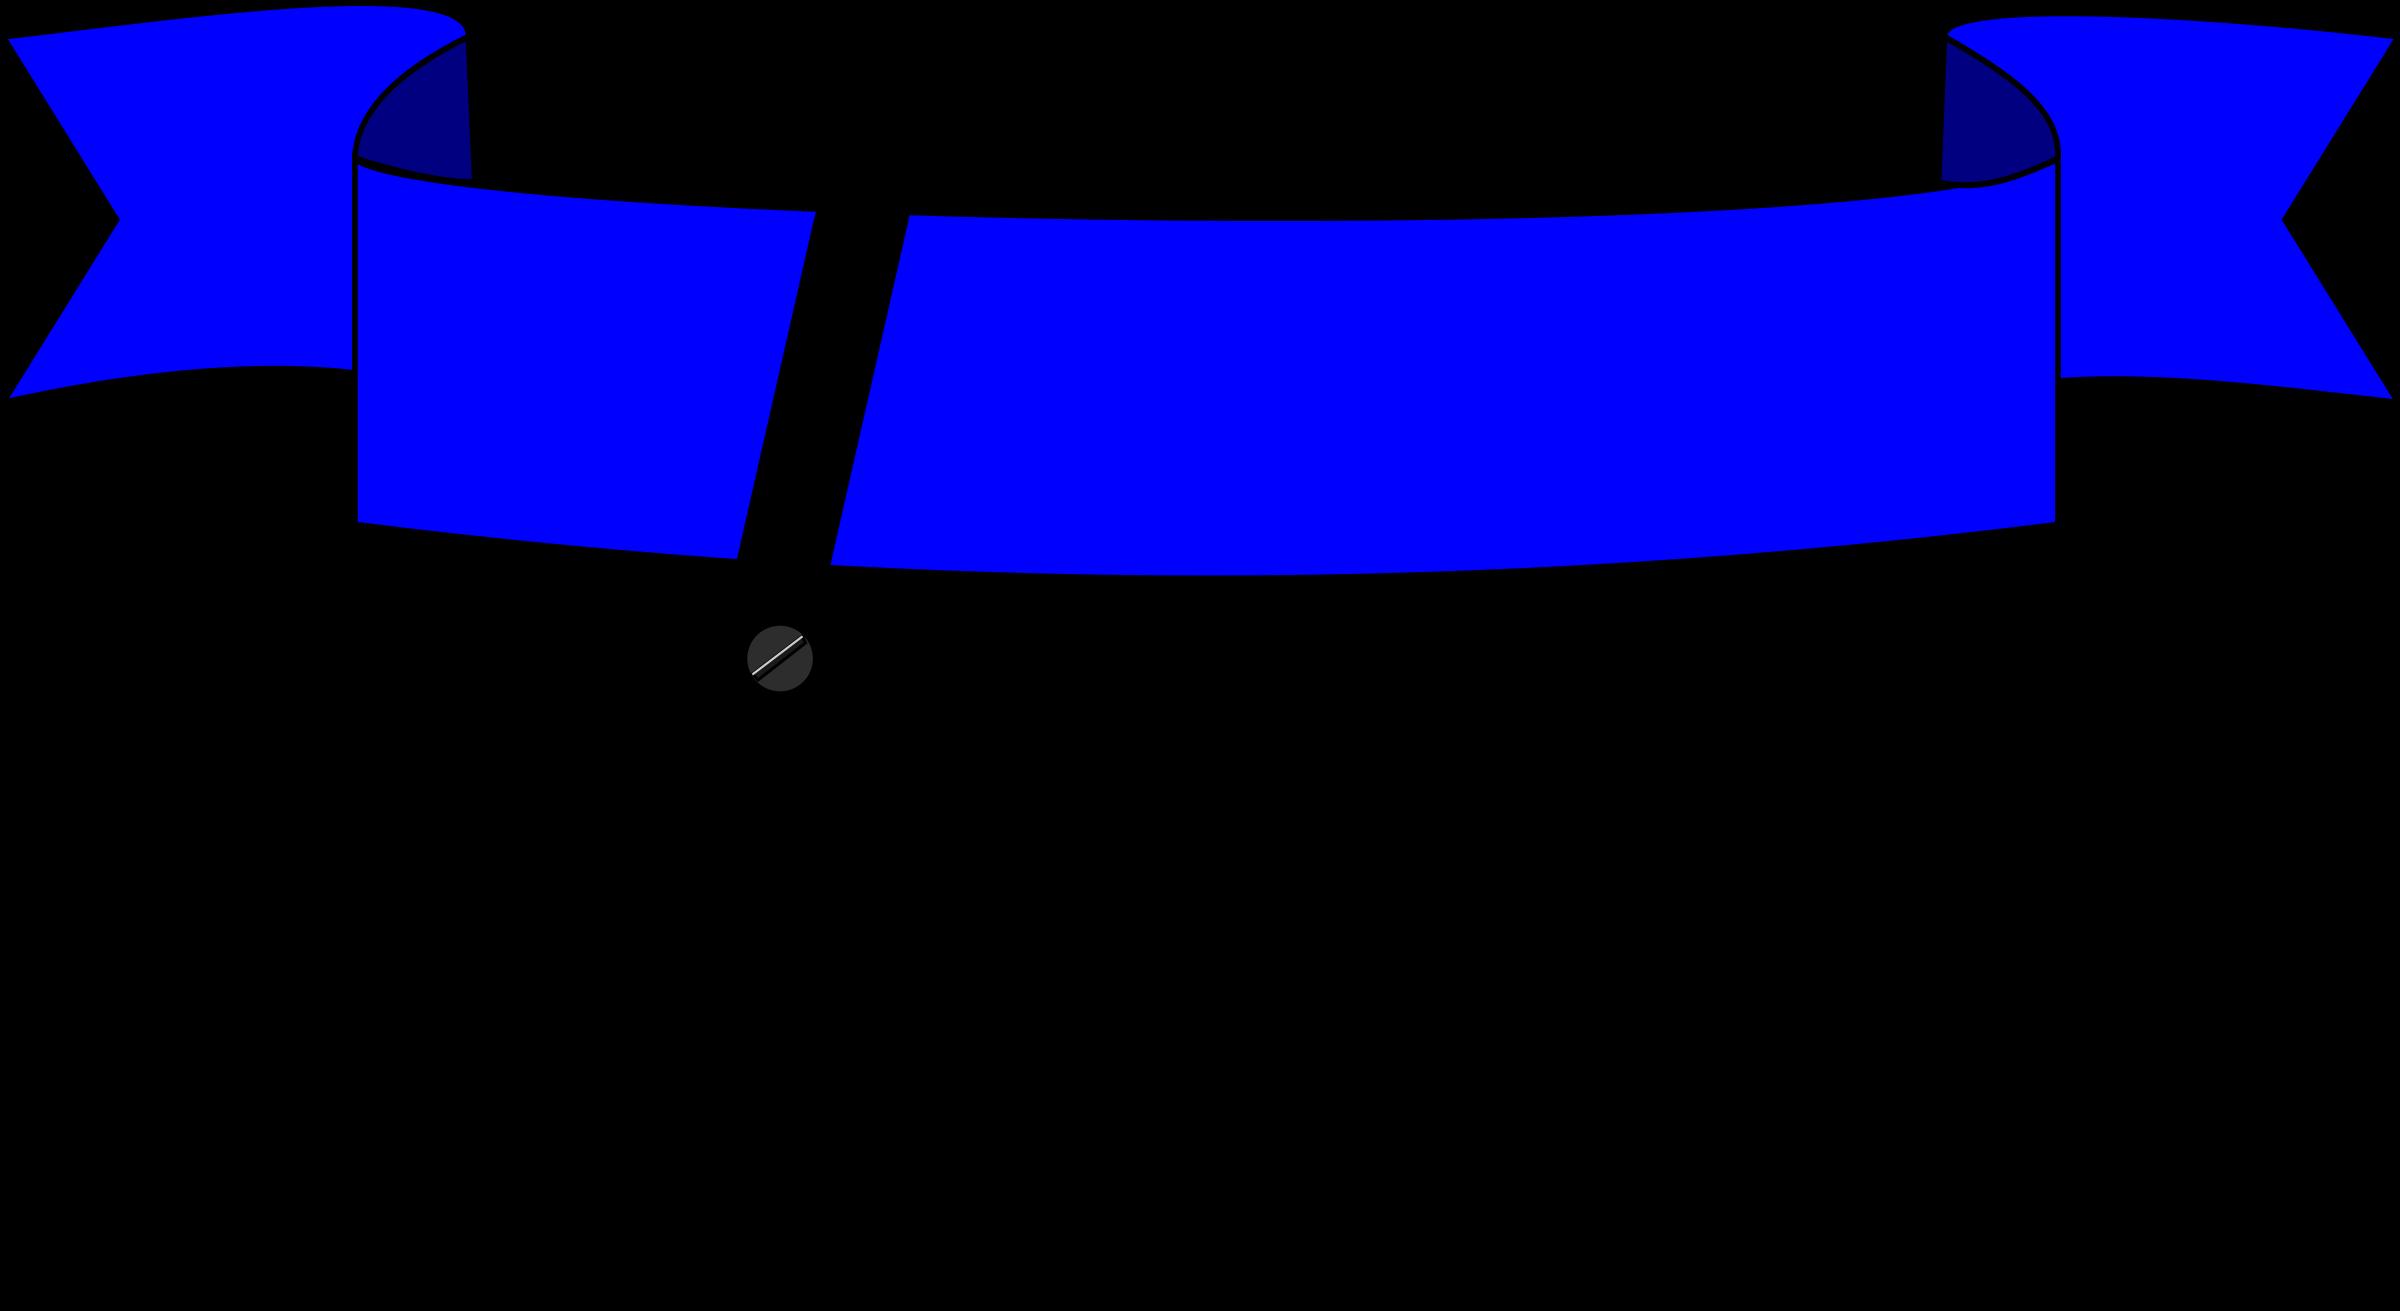 2400x1311 Clip Art Cutting Blue Ribbon Clipart